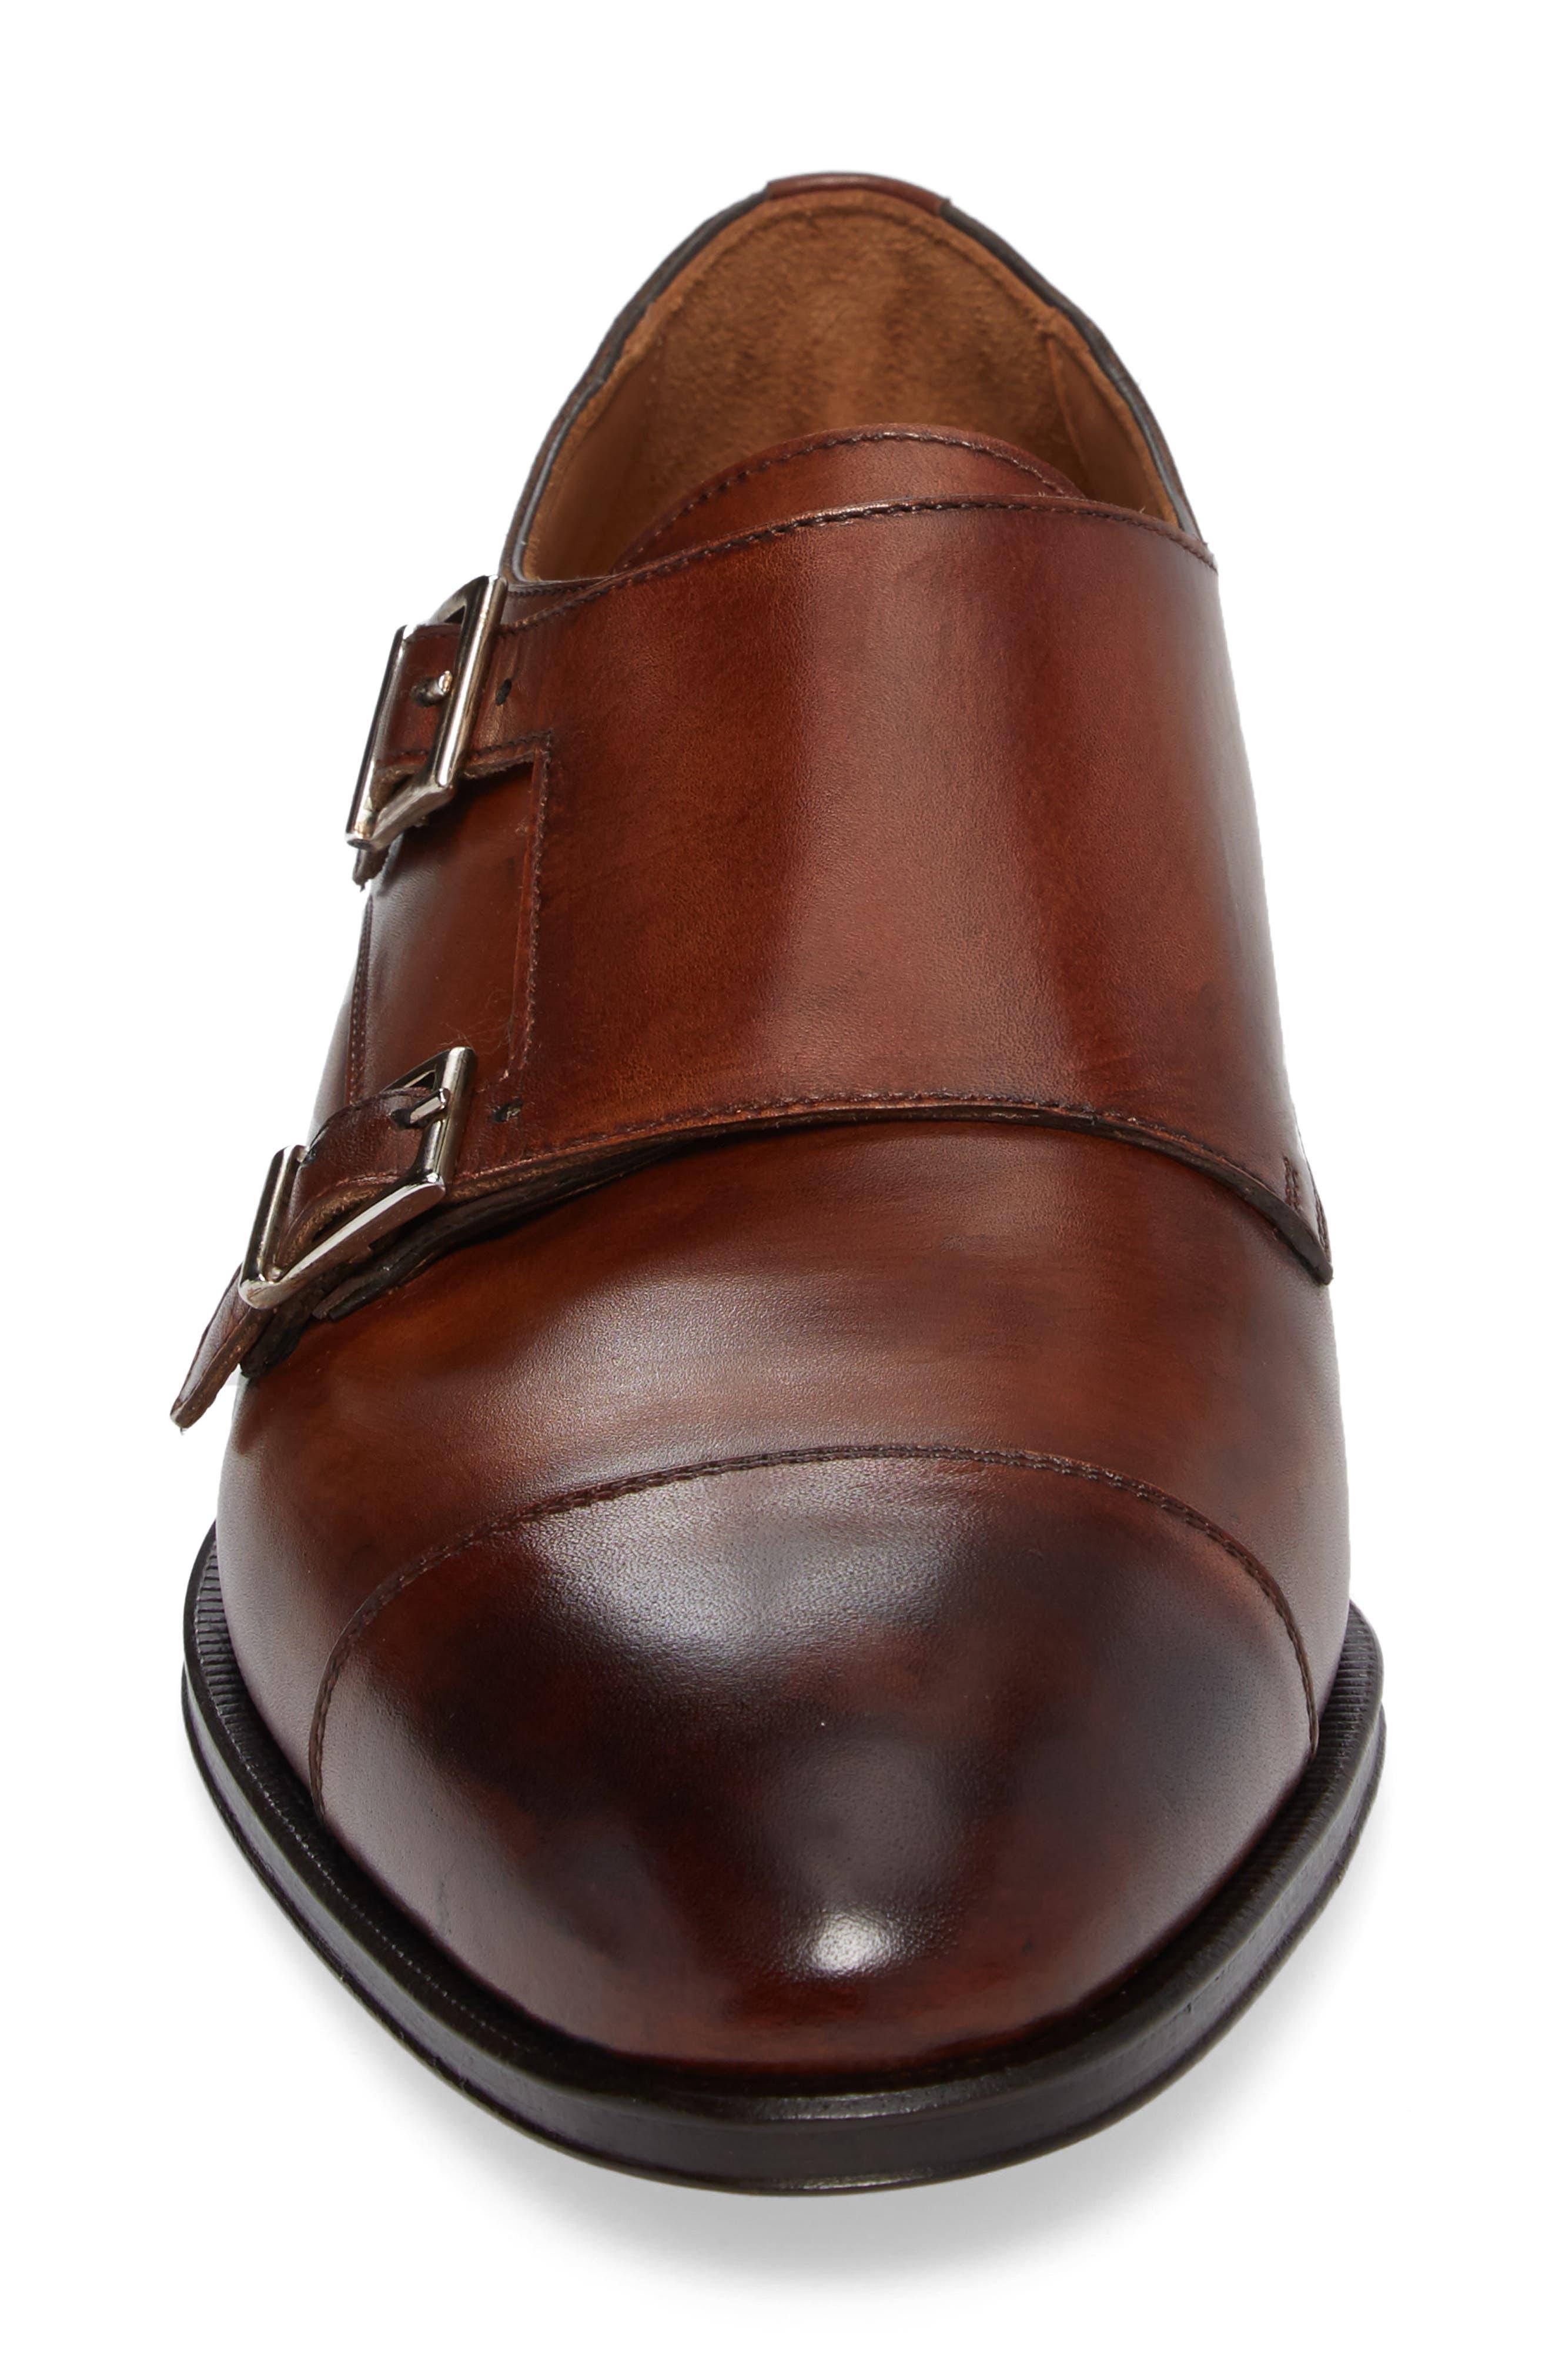 Gallo Bianco Double Monk Strap Shoe,                             Alternate thumbnail 4, color,                             201